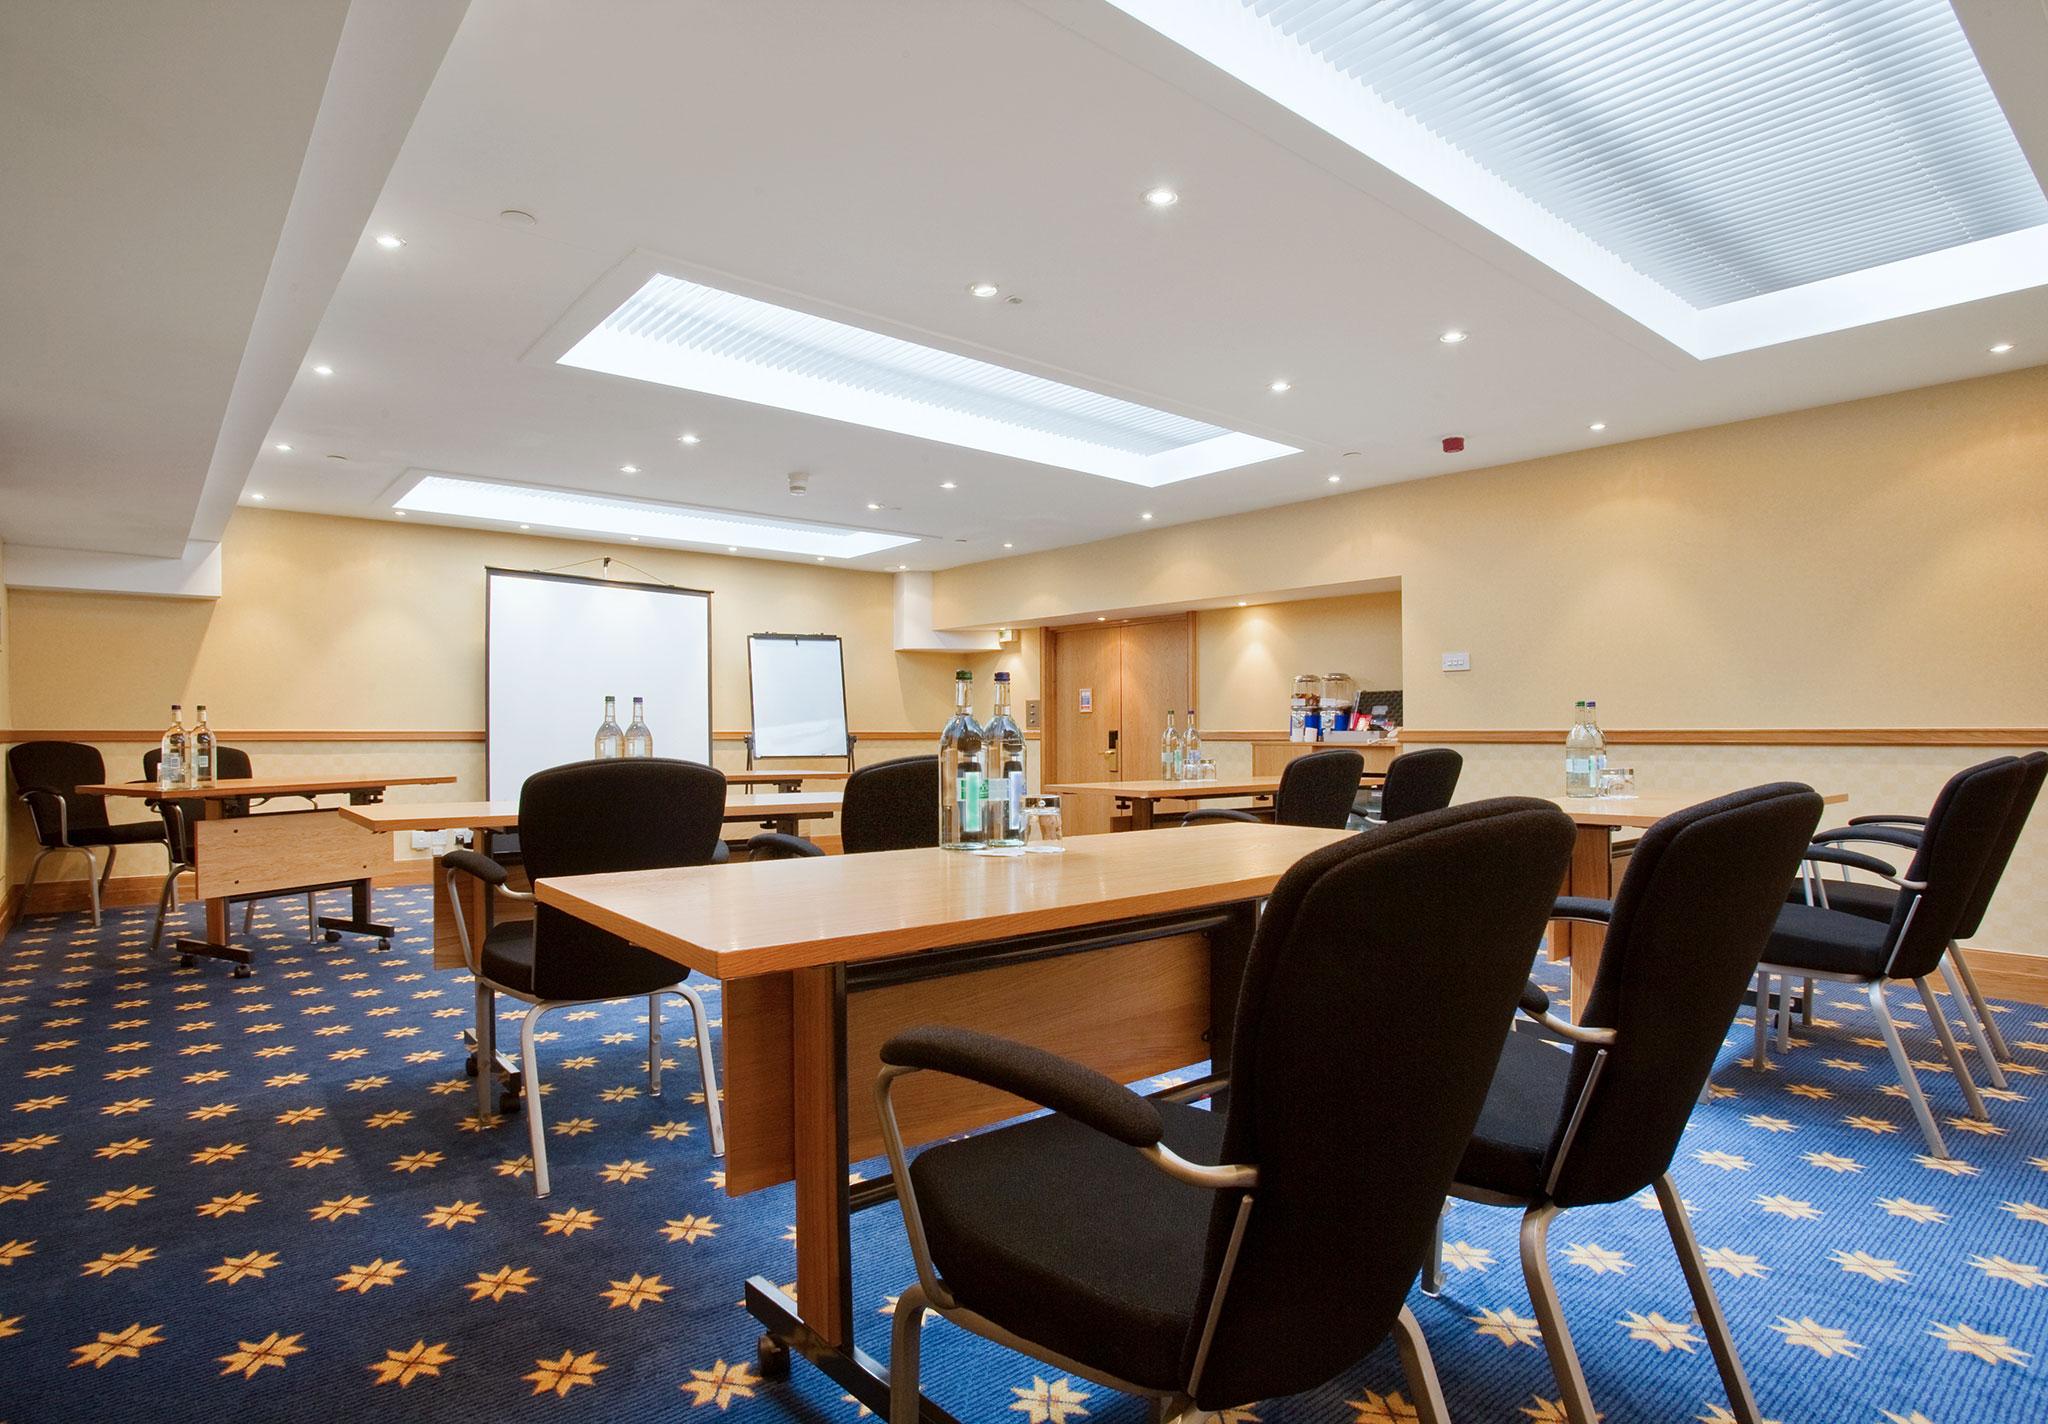 Hilton london kensington hotel hotel a kensington londra for Planimetrie per aggiunta suite in legge